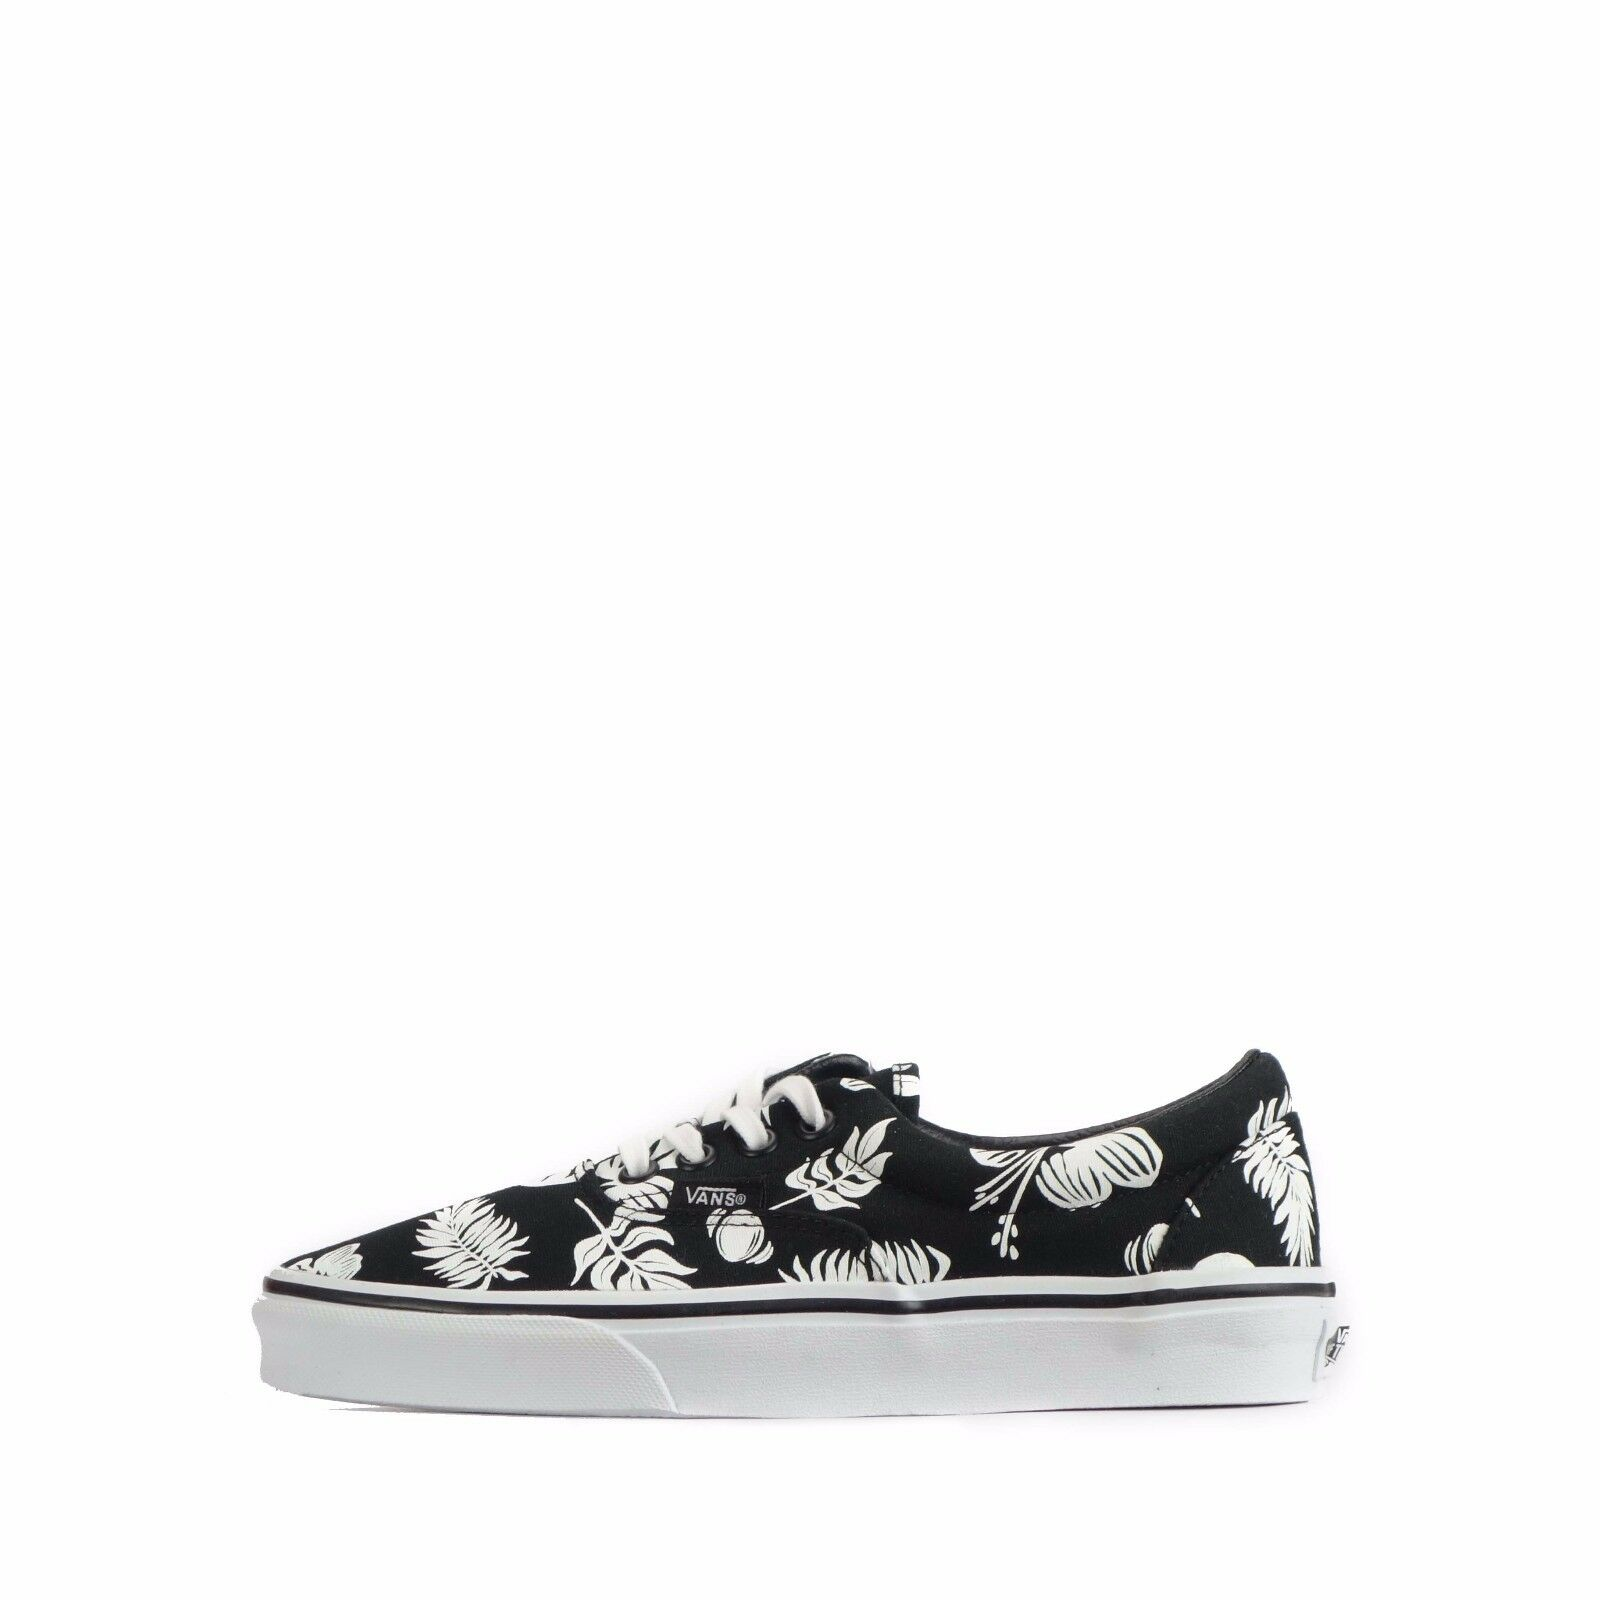 Van's Era (MLX) Floral Unisex shoes Tropicoco Black